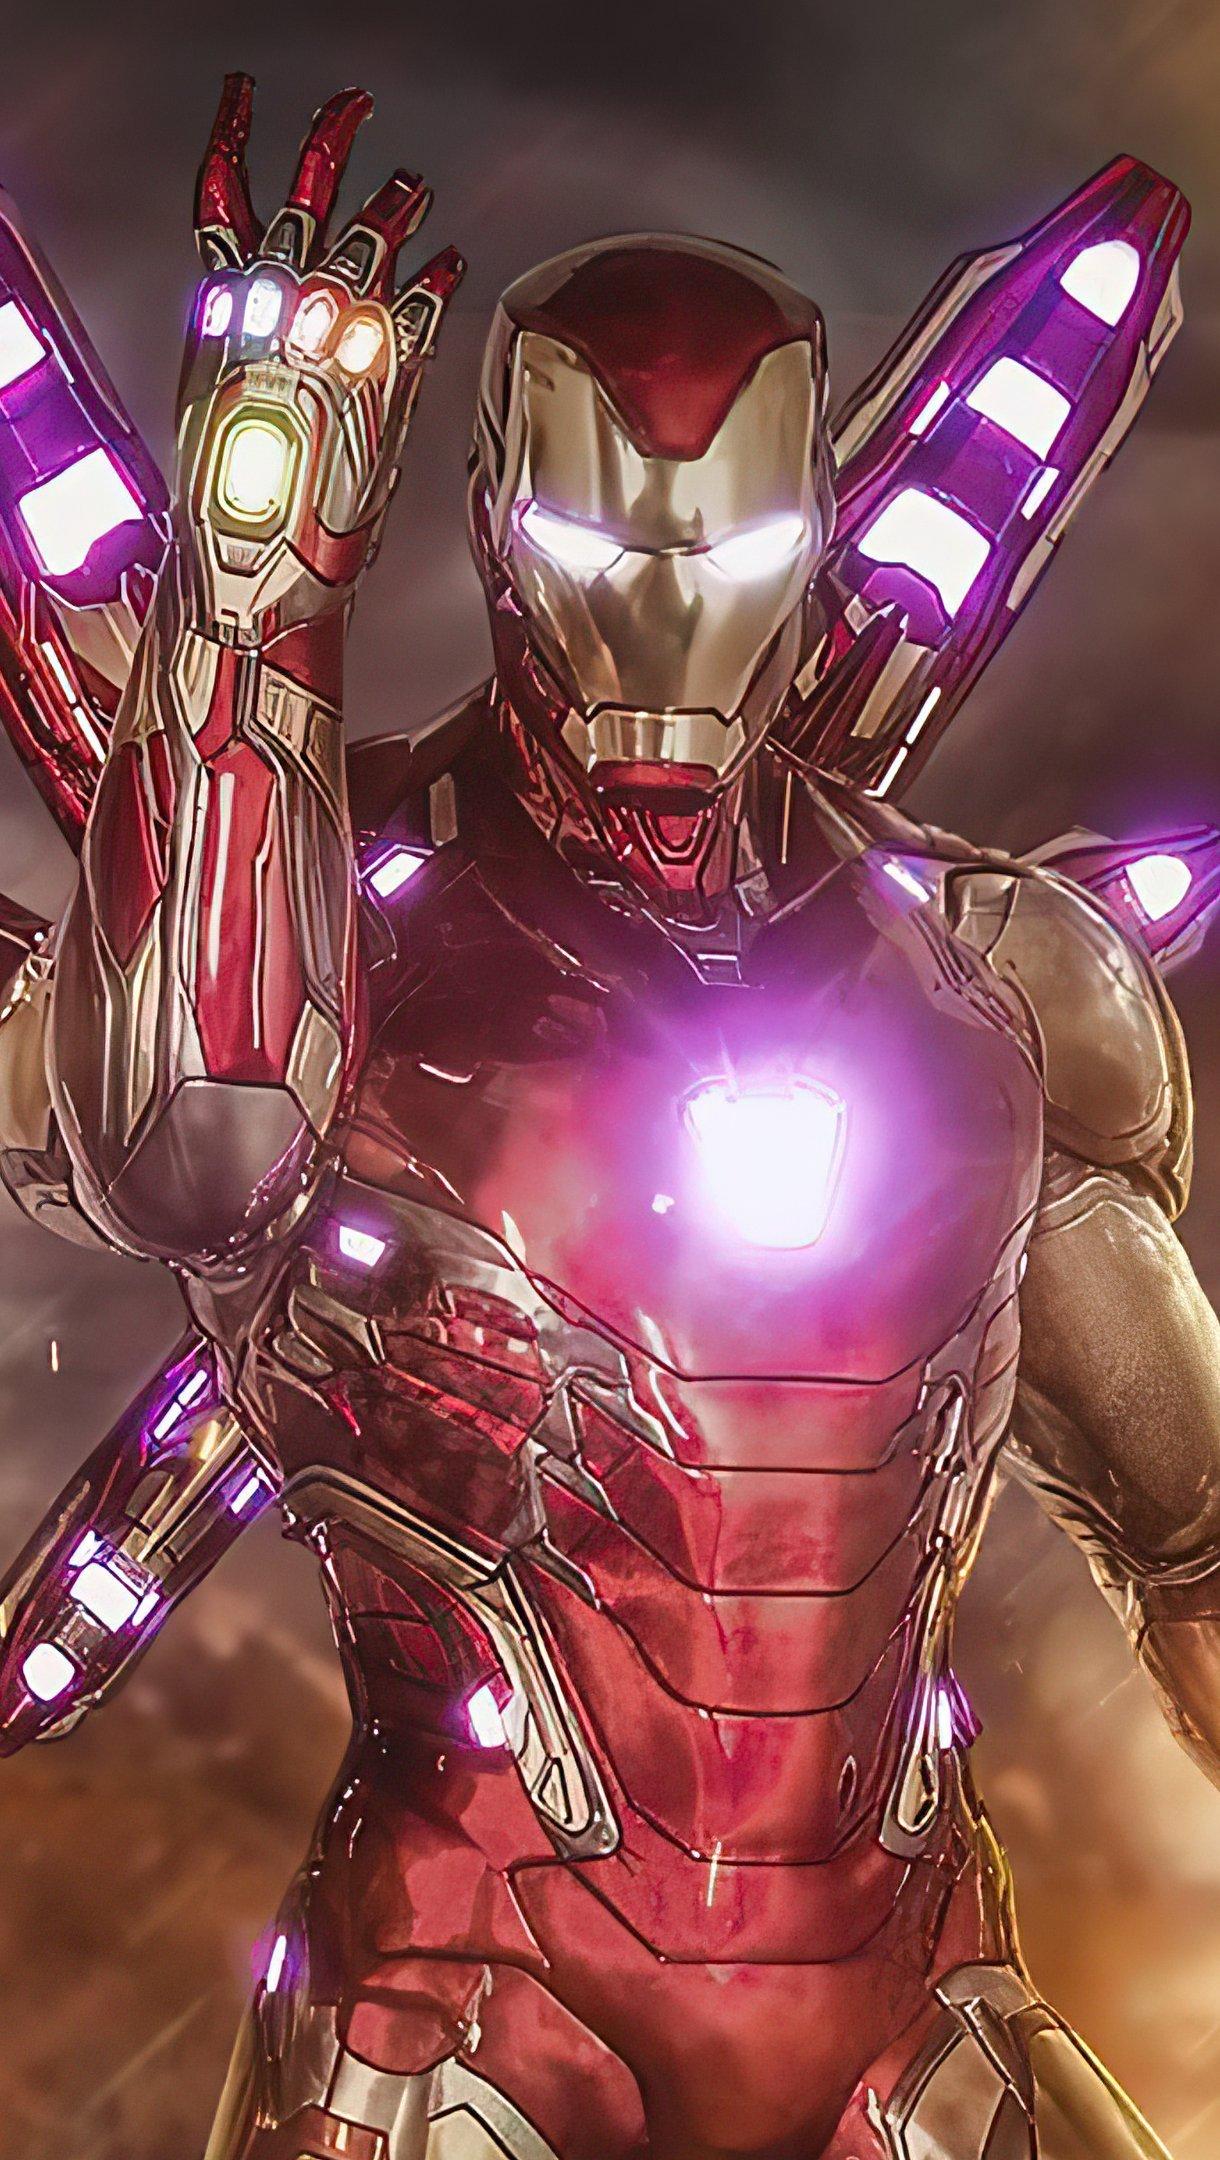 Iron man new suit 2020 Wallpaper 4k ...